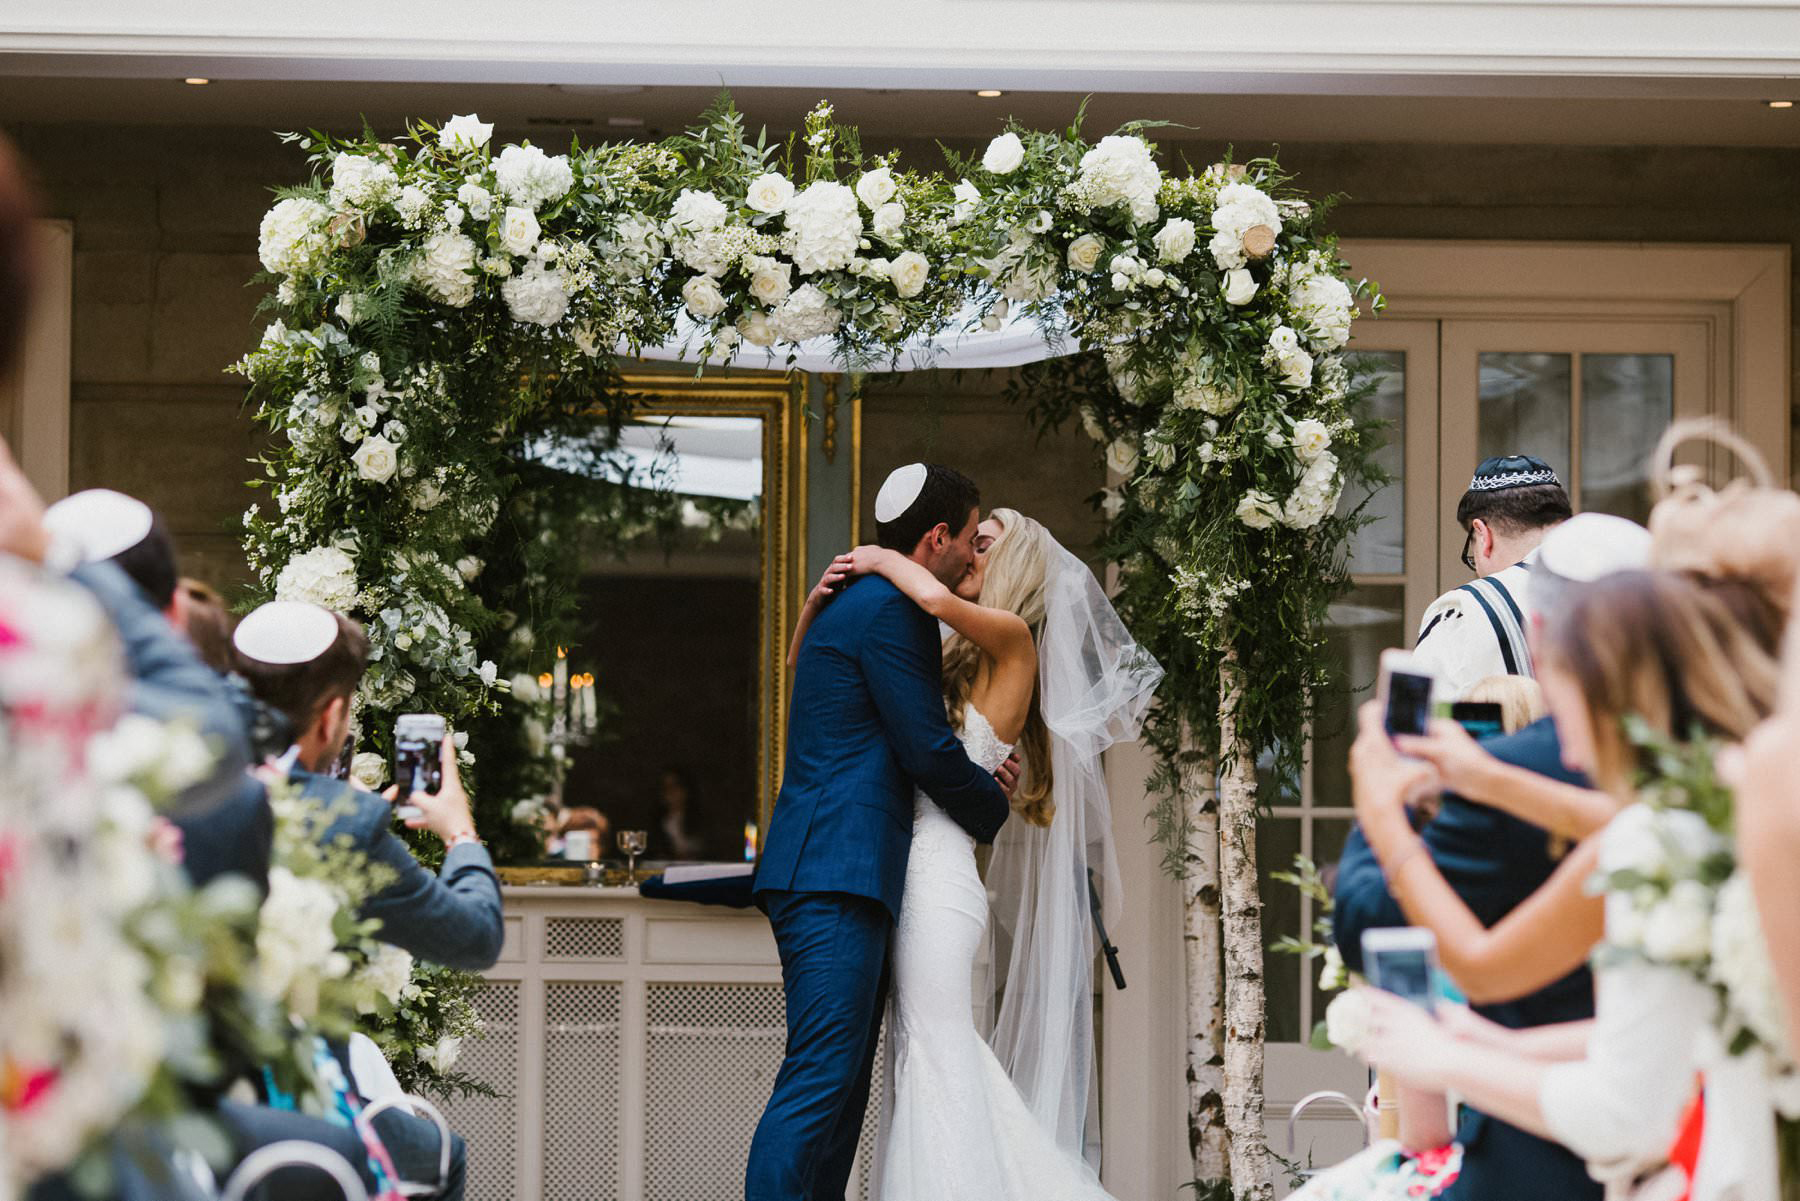 Fleuriste_Flowers_Weddings_ireland_5.jpg